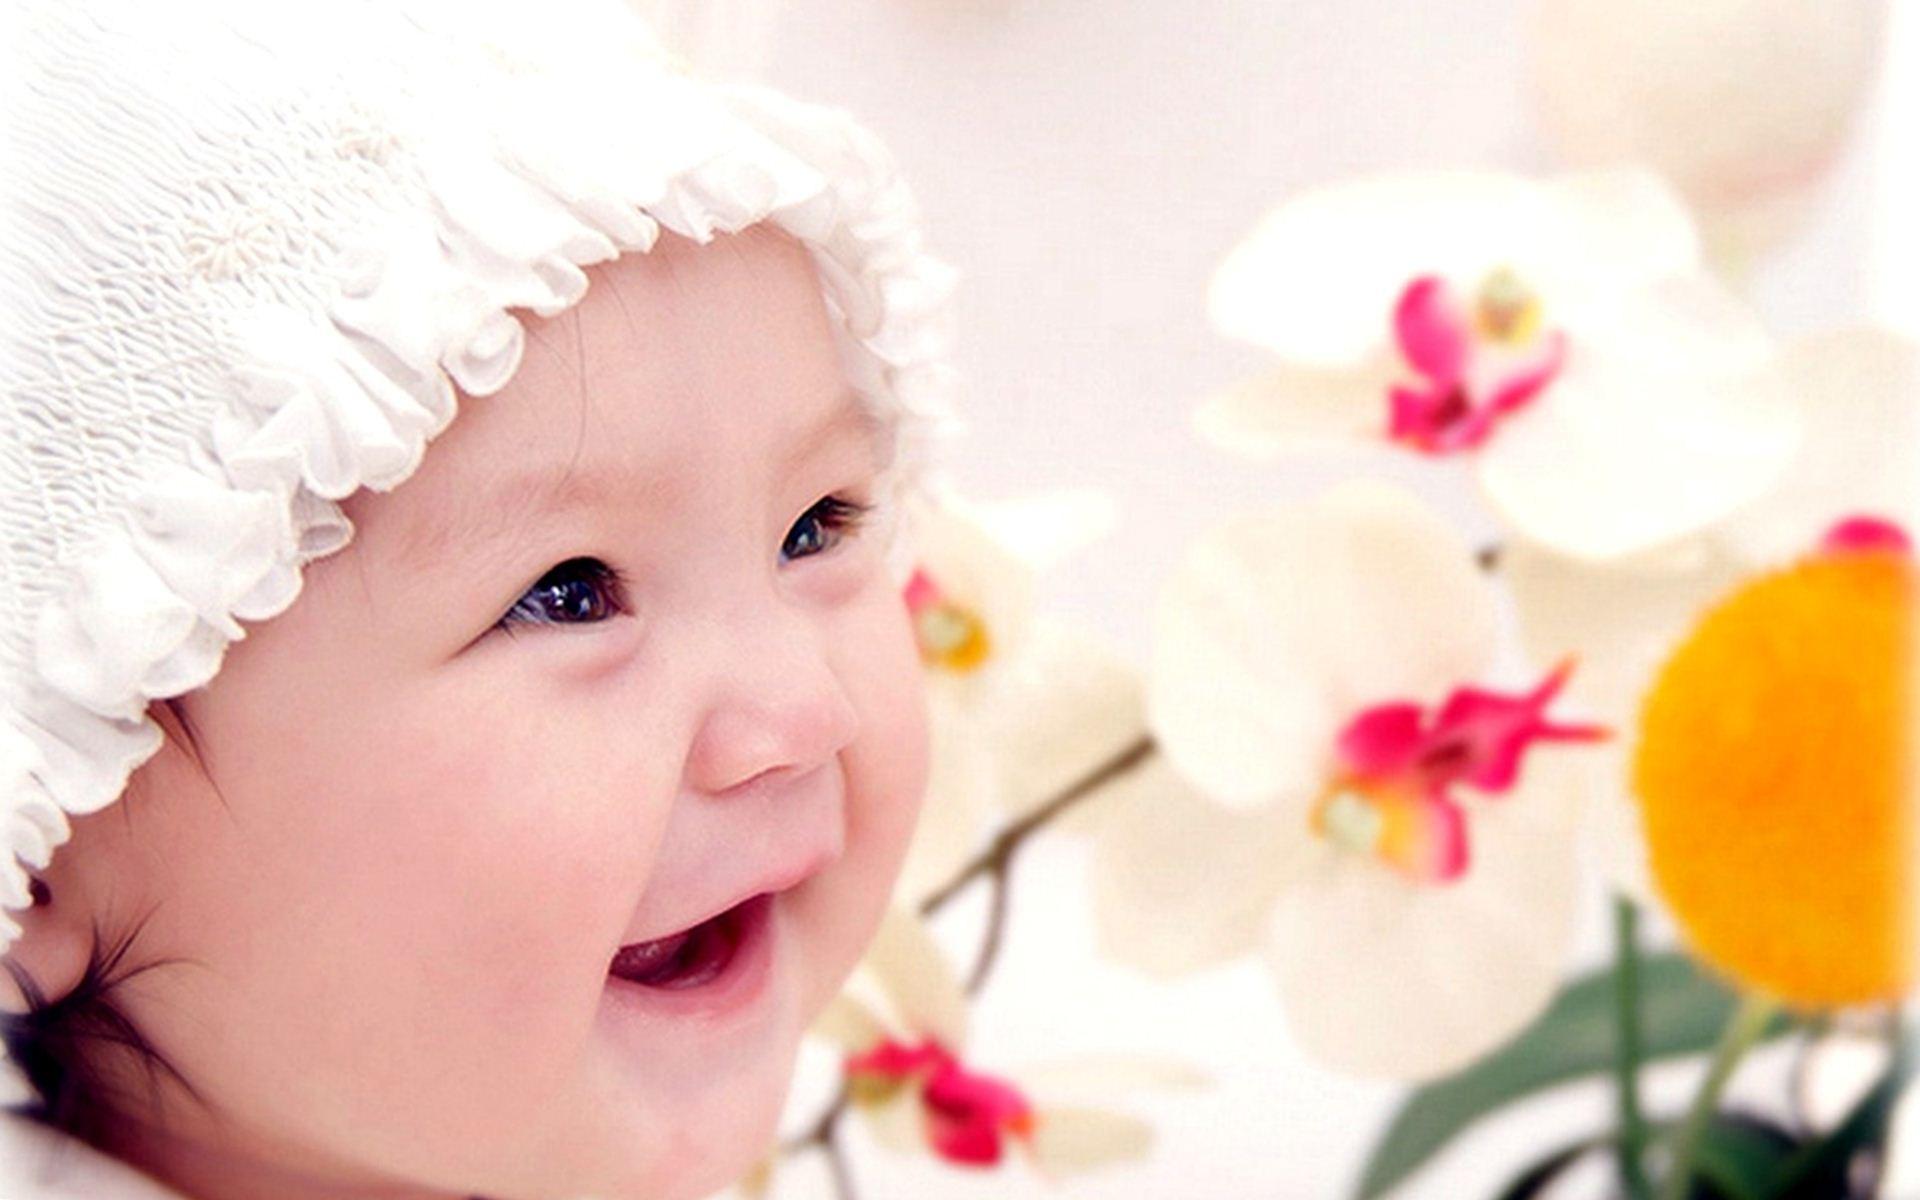 Cute Kids Babies HD Wallpapers in jpg format for free